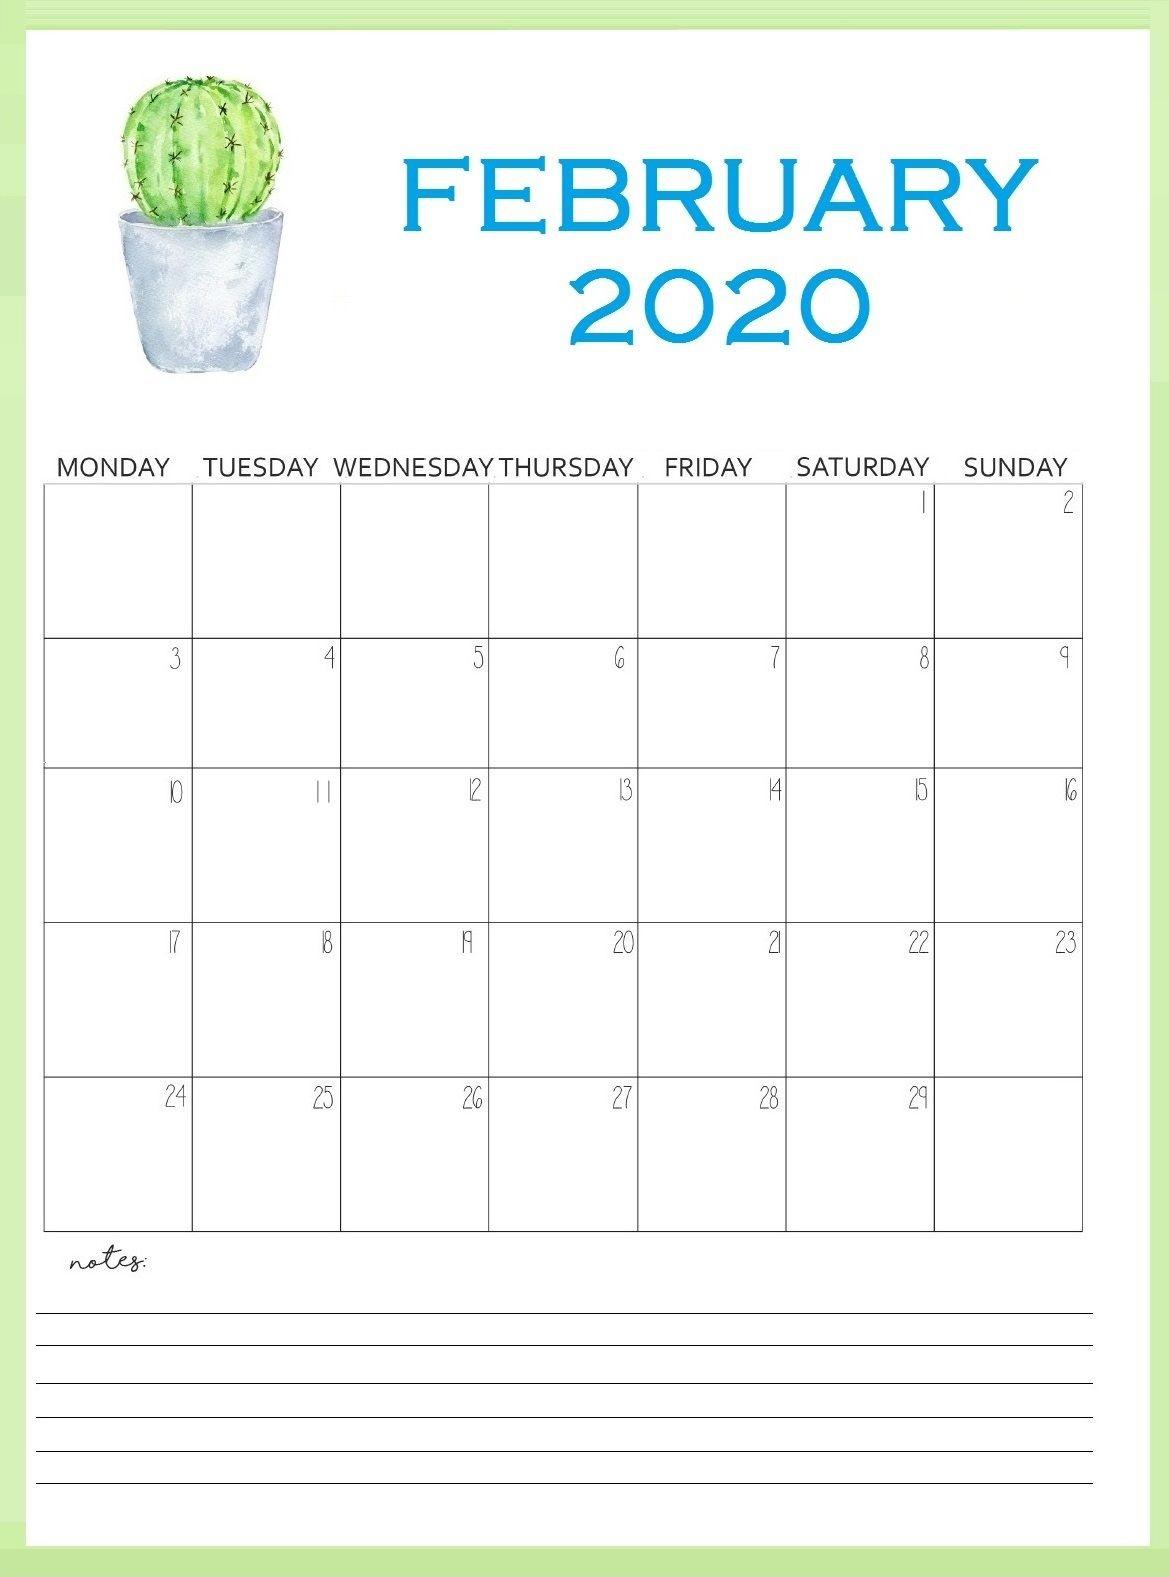 Printable February 2020 Wall Calendar In 2020 | Free-2020 Wall Calendar Template